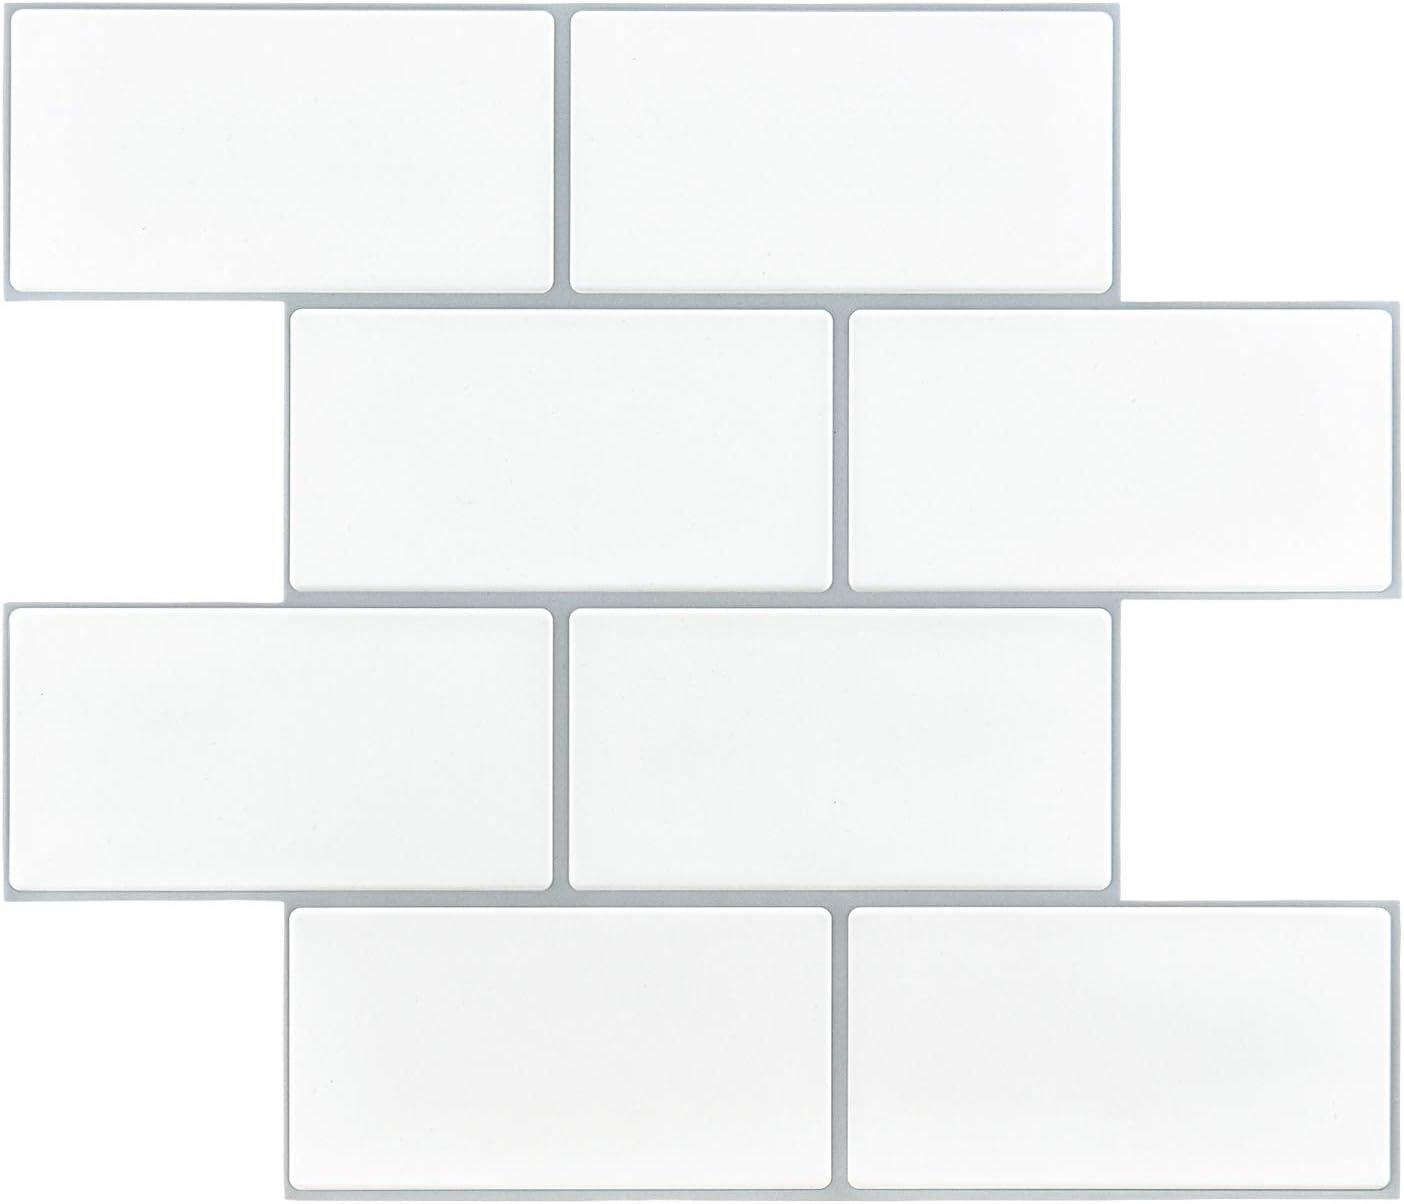 "Art3d 14""x12"" EVA Self-Adhesive Backsplash Tiles, Faux Ceramic Tiles, Matt (10 Tiles, Thicker Version)"